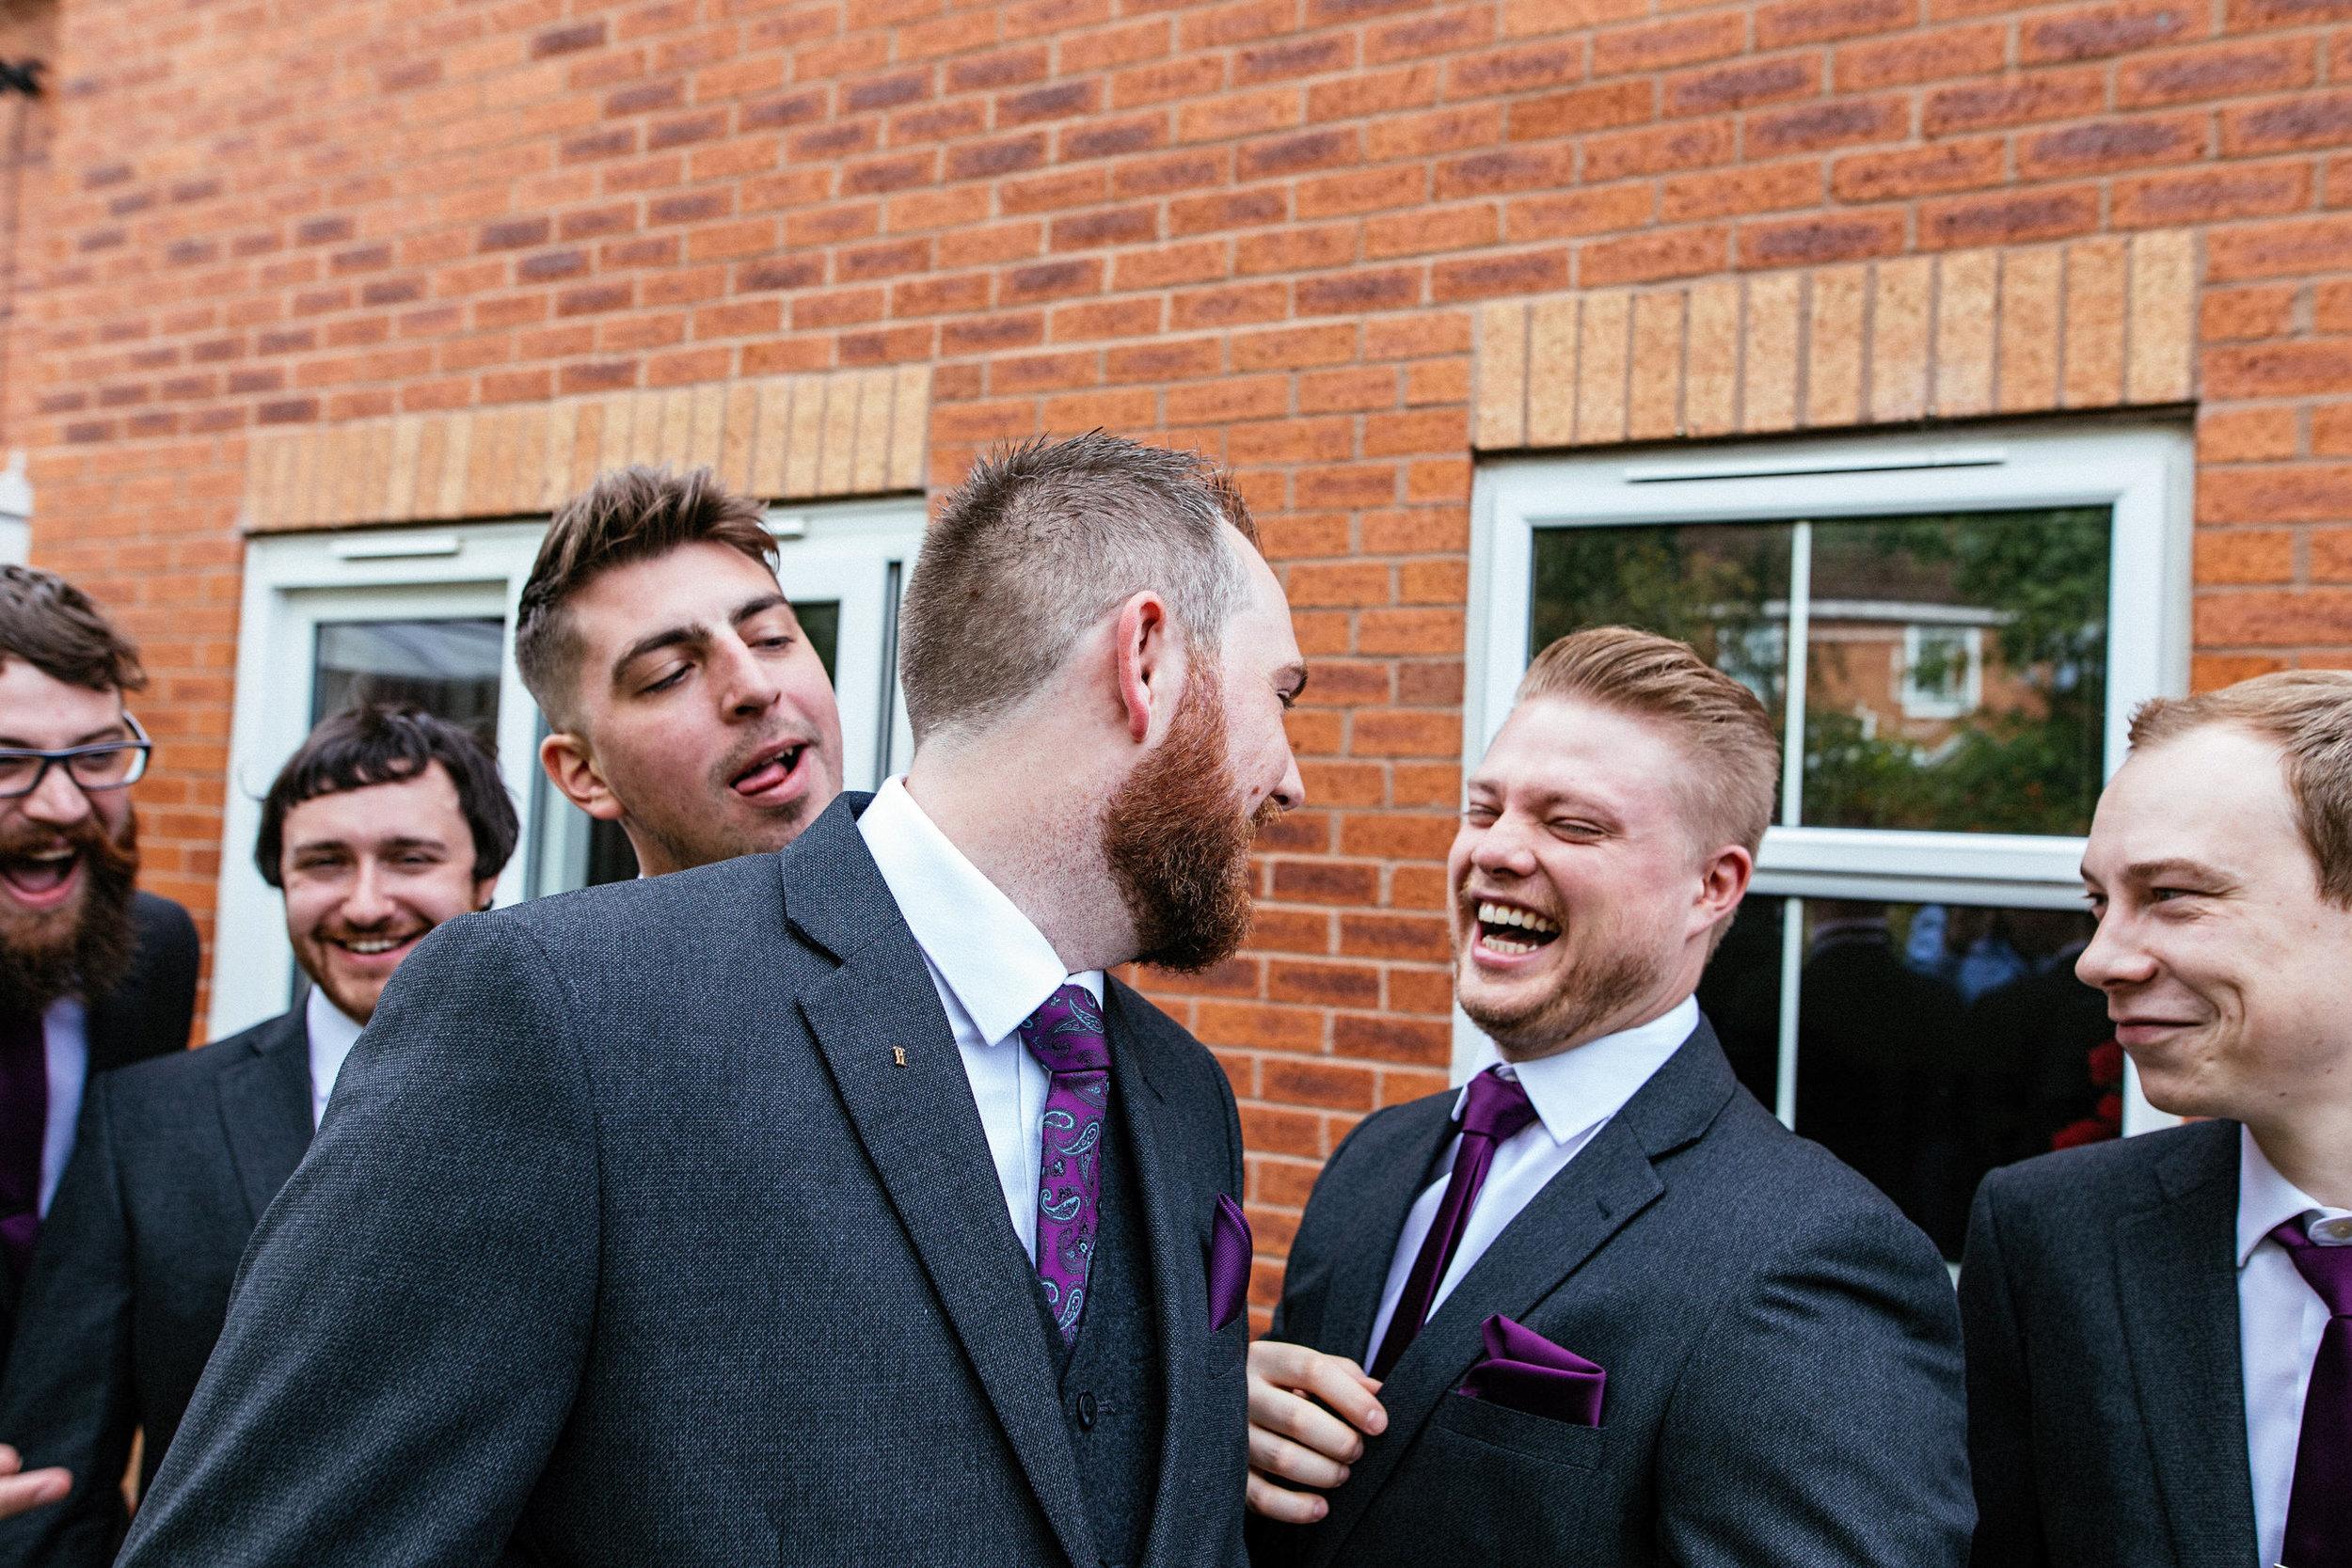 The-Bond-Company-Wedding-Photography-7-1.jpg